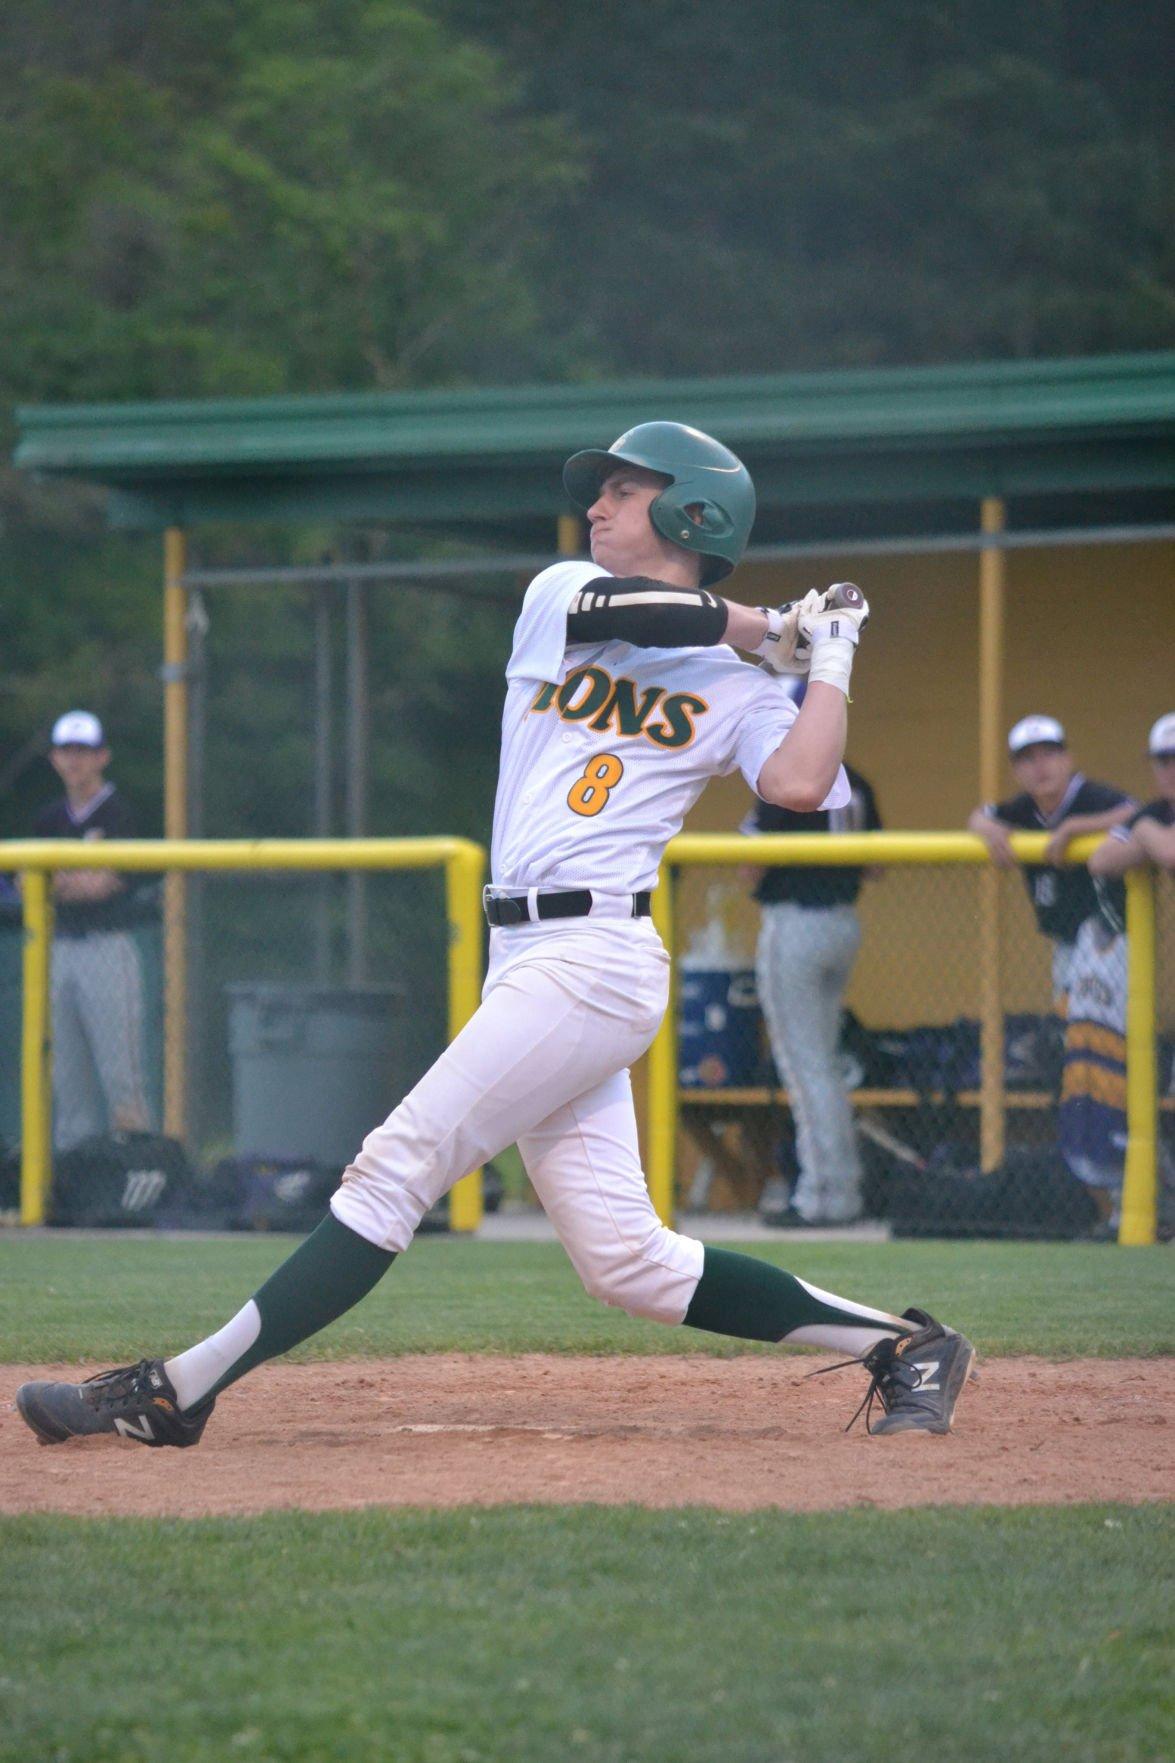 FSHS-Doyle baseball Roman Hodges